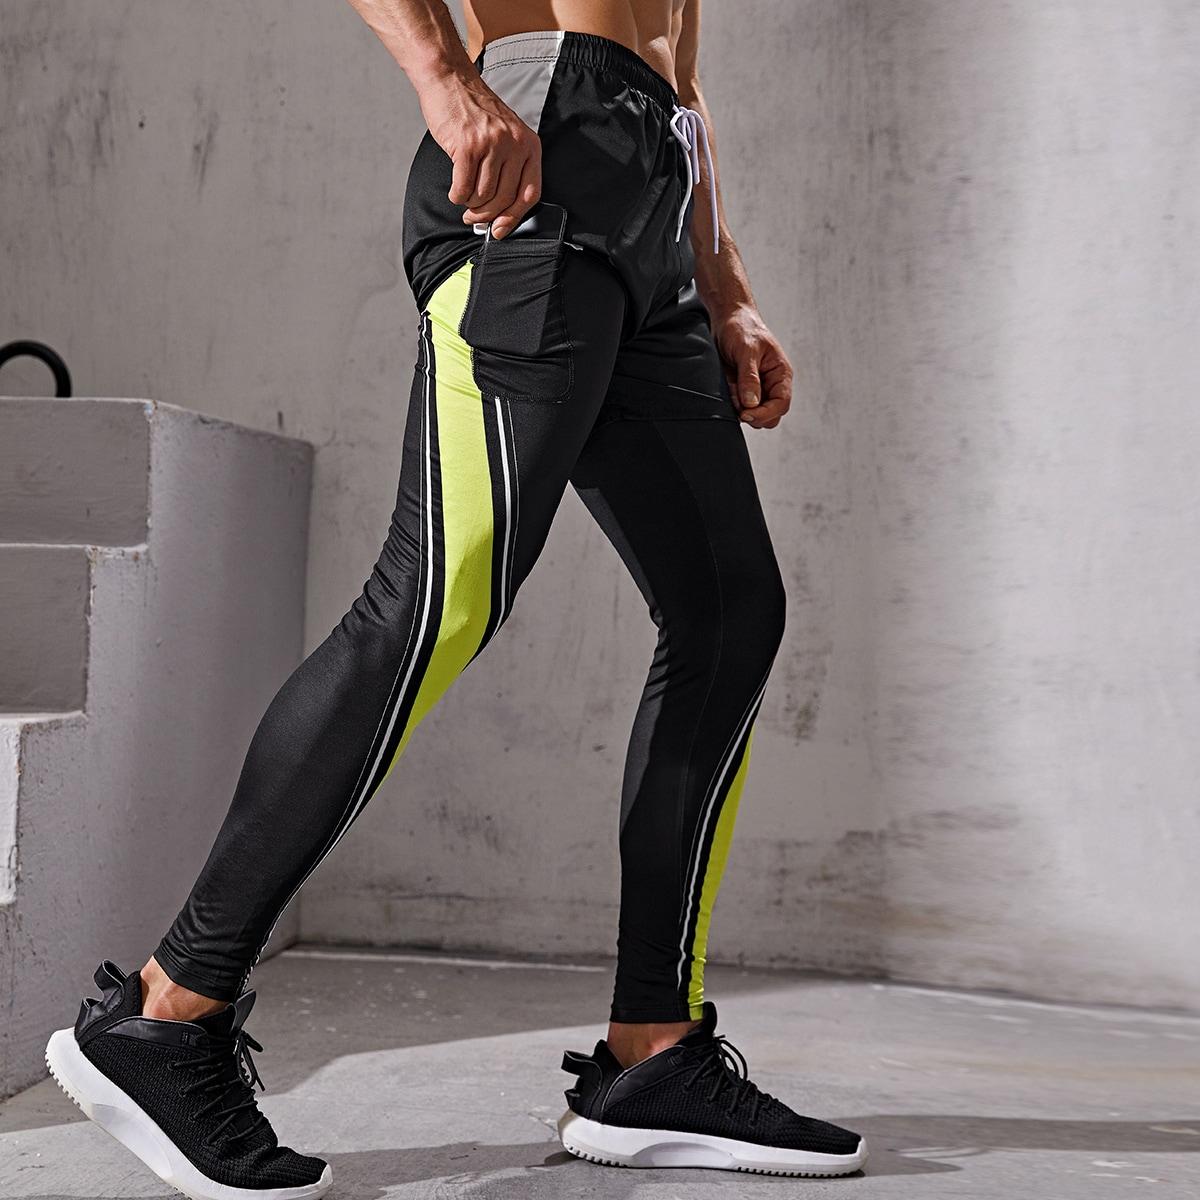 Medias deportivas de cintura con cordón 2 en 1 panel en contraste con bolsillo de celular